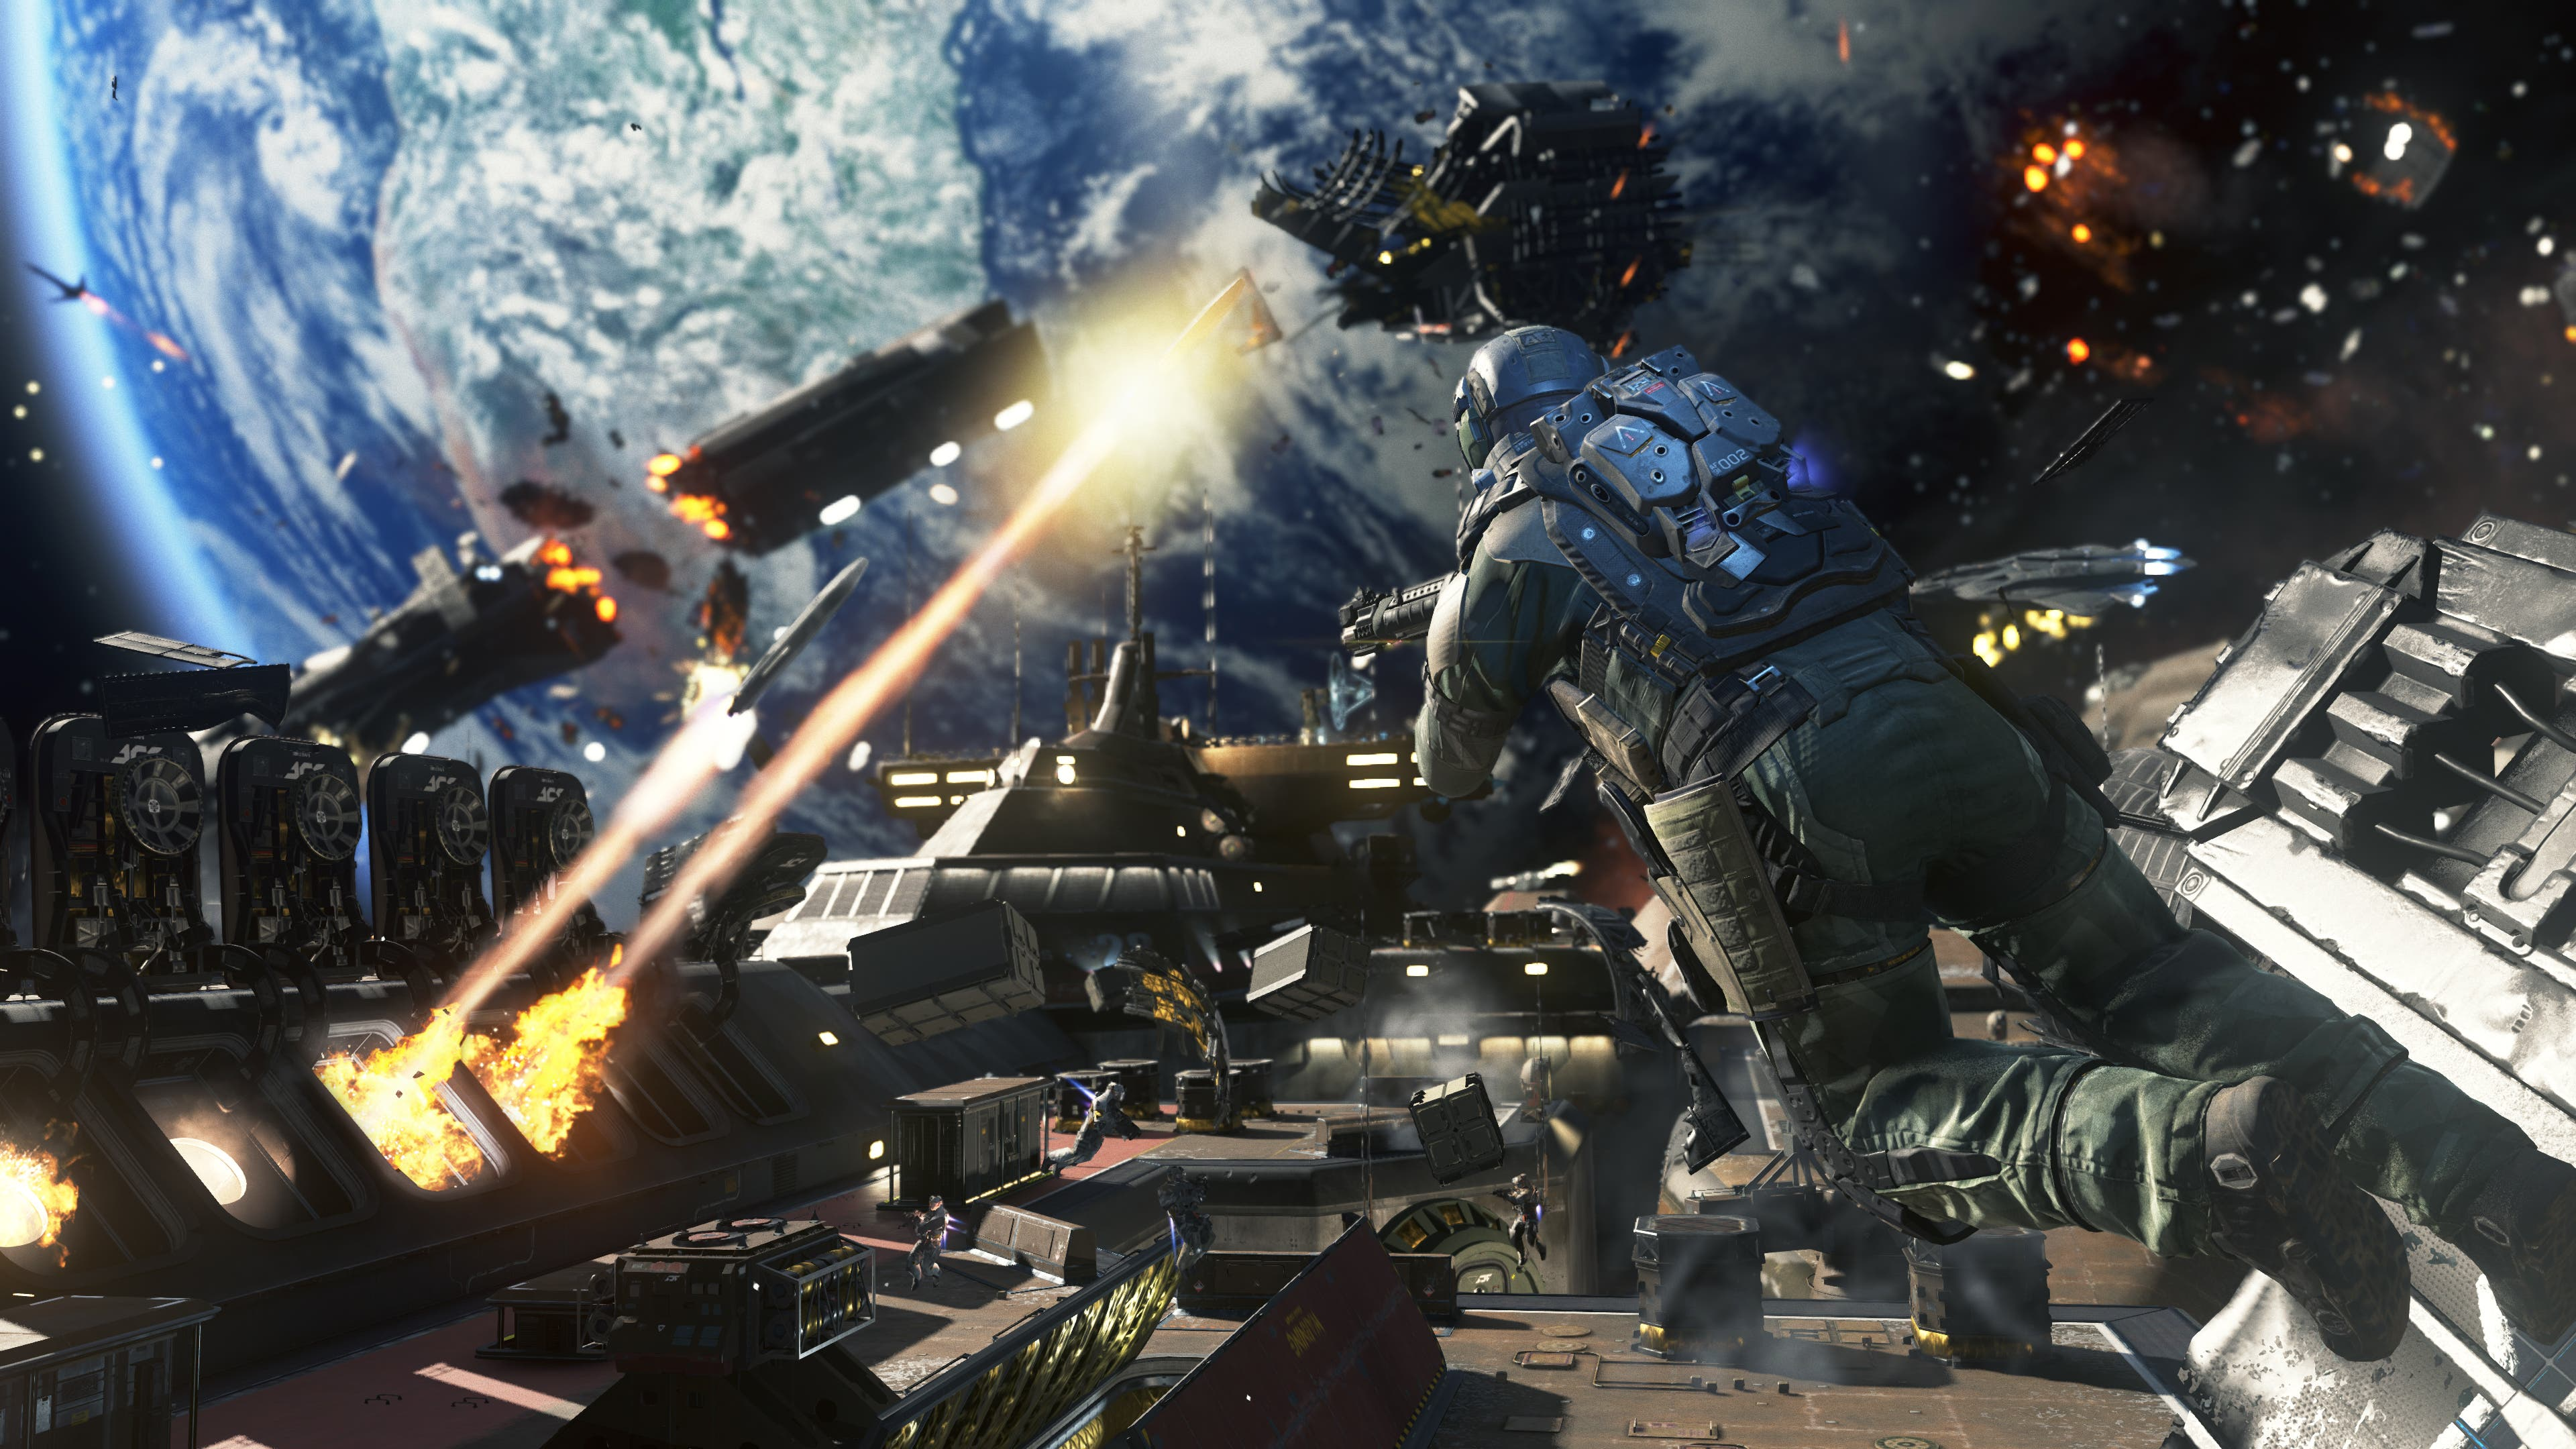 COW IW_E3_Ship Assault Zero G Combat